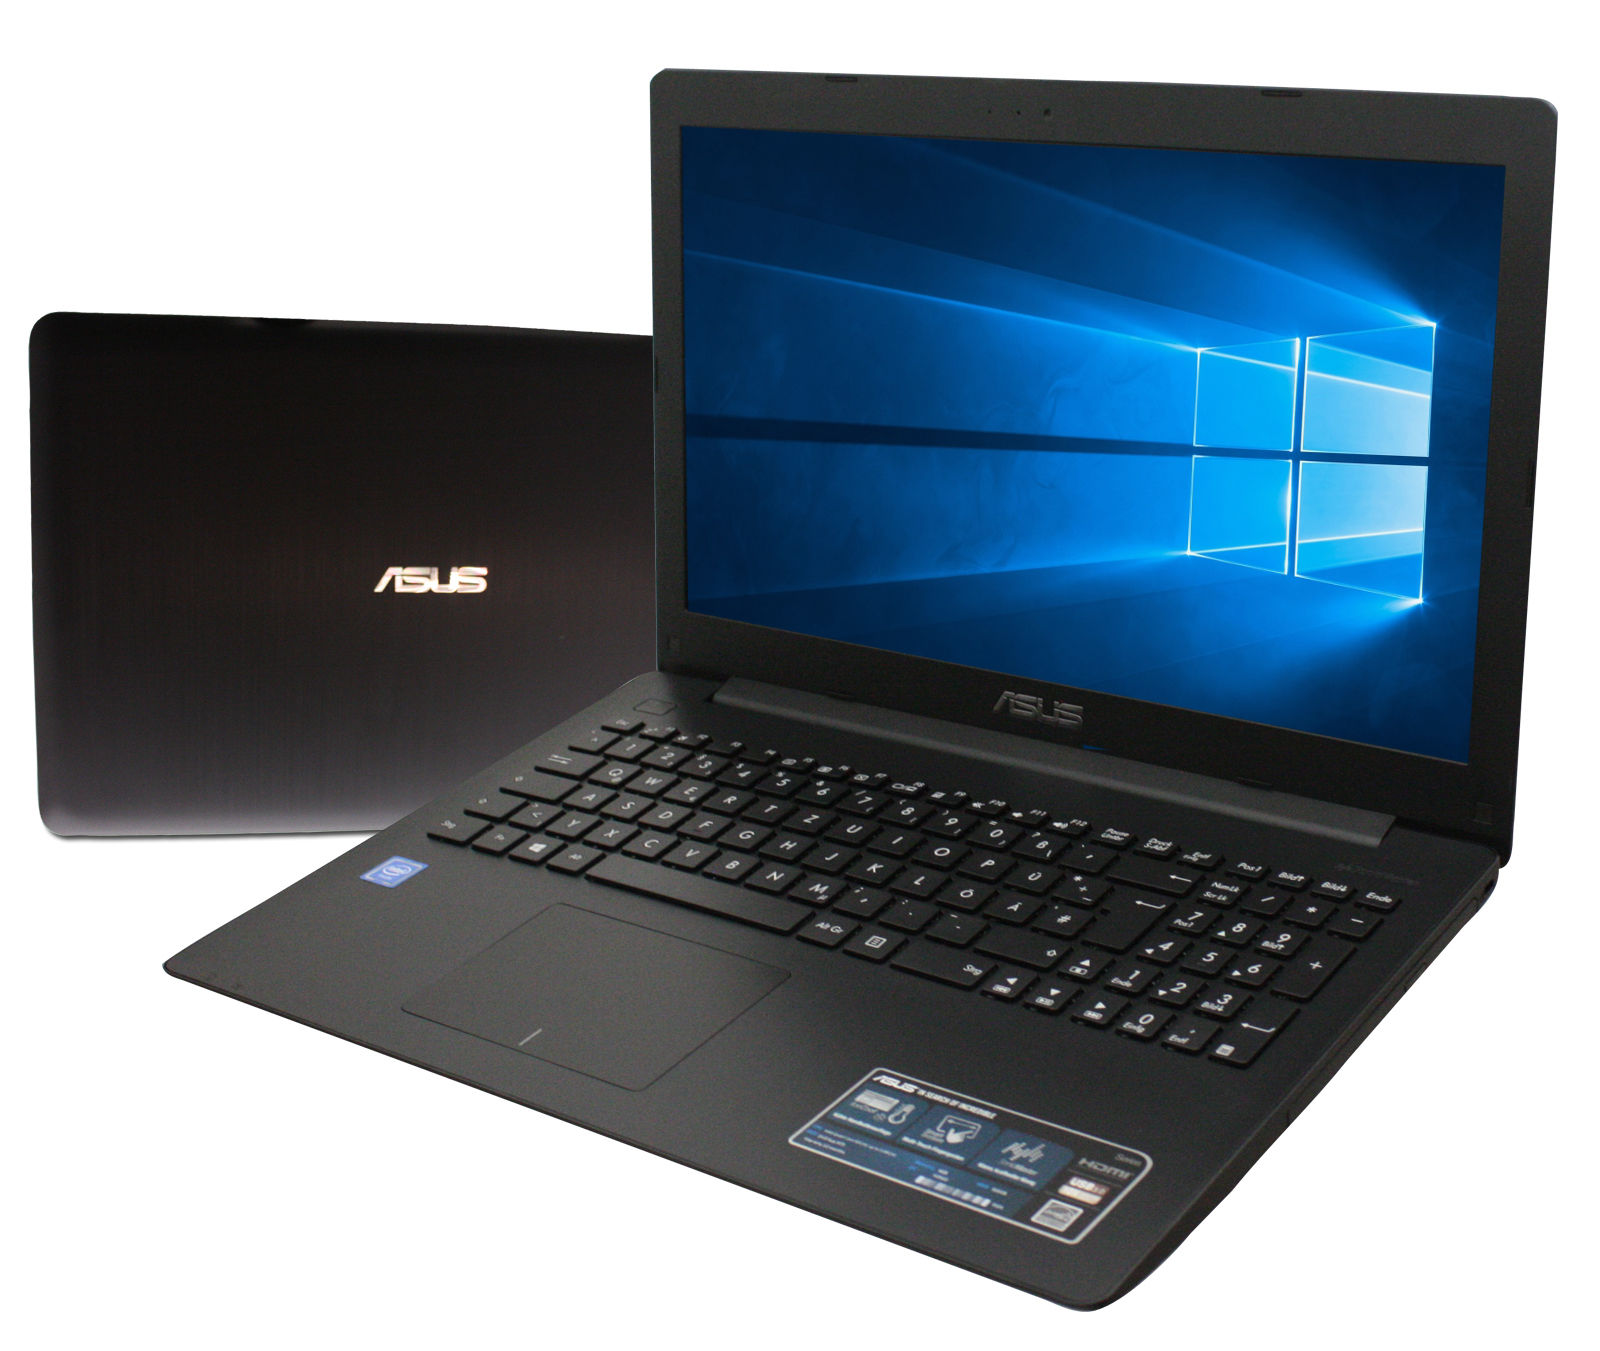 ASUS  17 Zoll  -Pentium Quad - 4 x 2,56 GHz - 500GB HDD - Schwarz - Win10